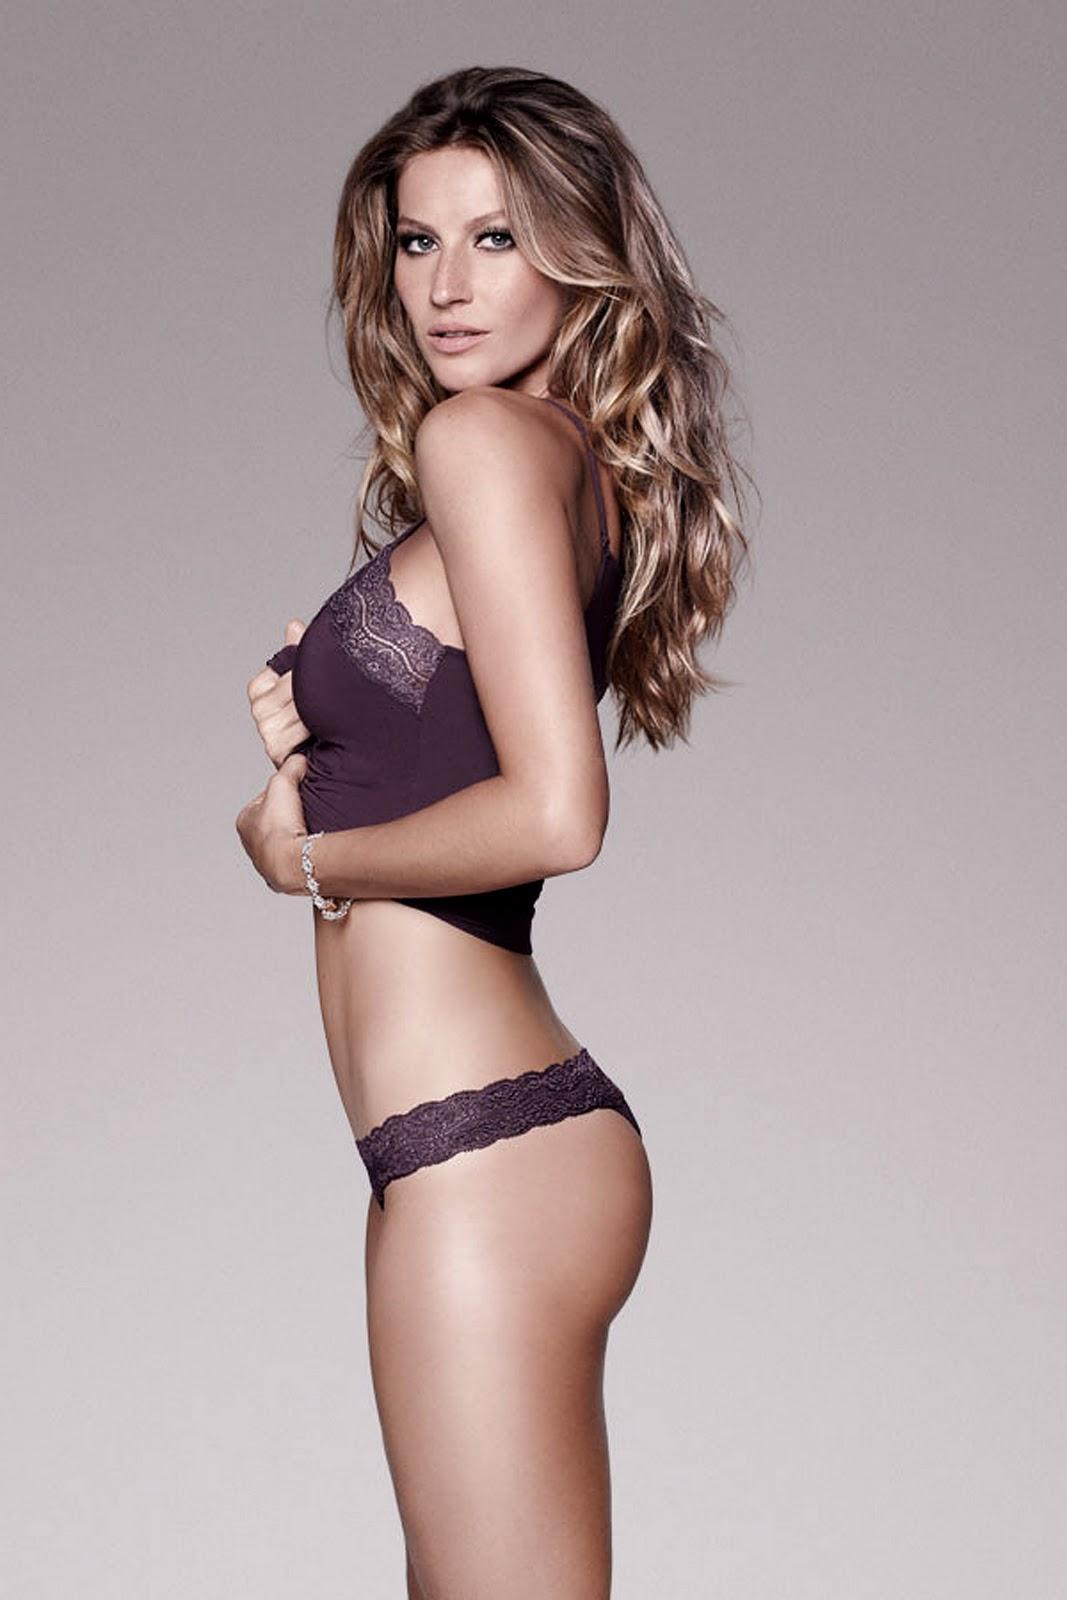 beautiful girls: Gisele Bündchen Lingerie Pictures Remind ...